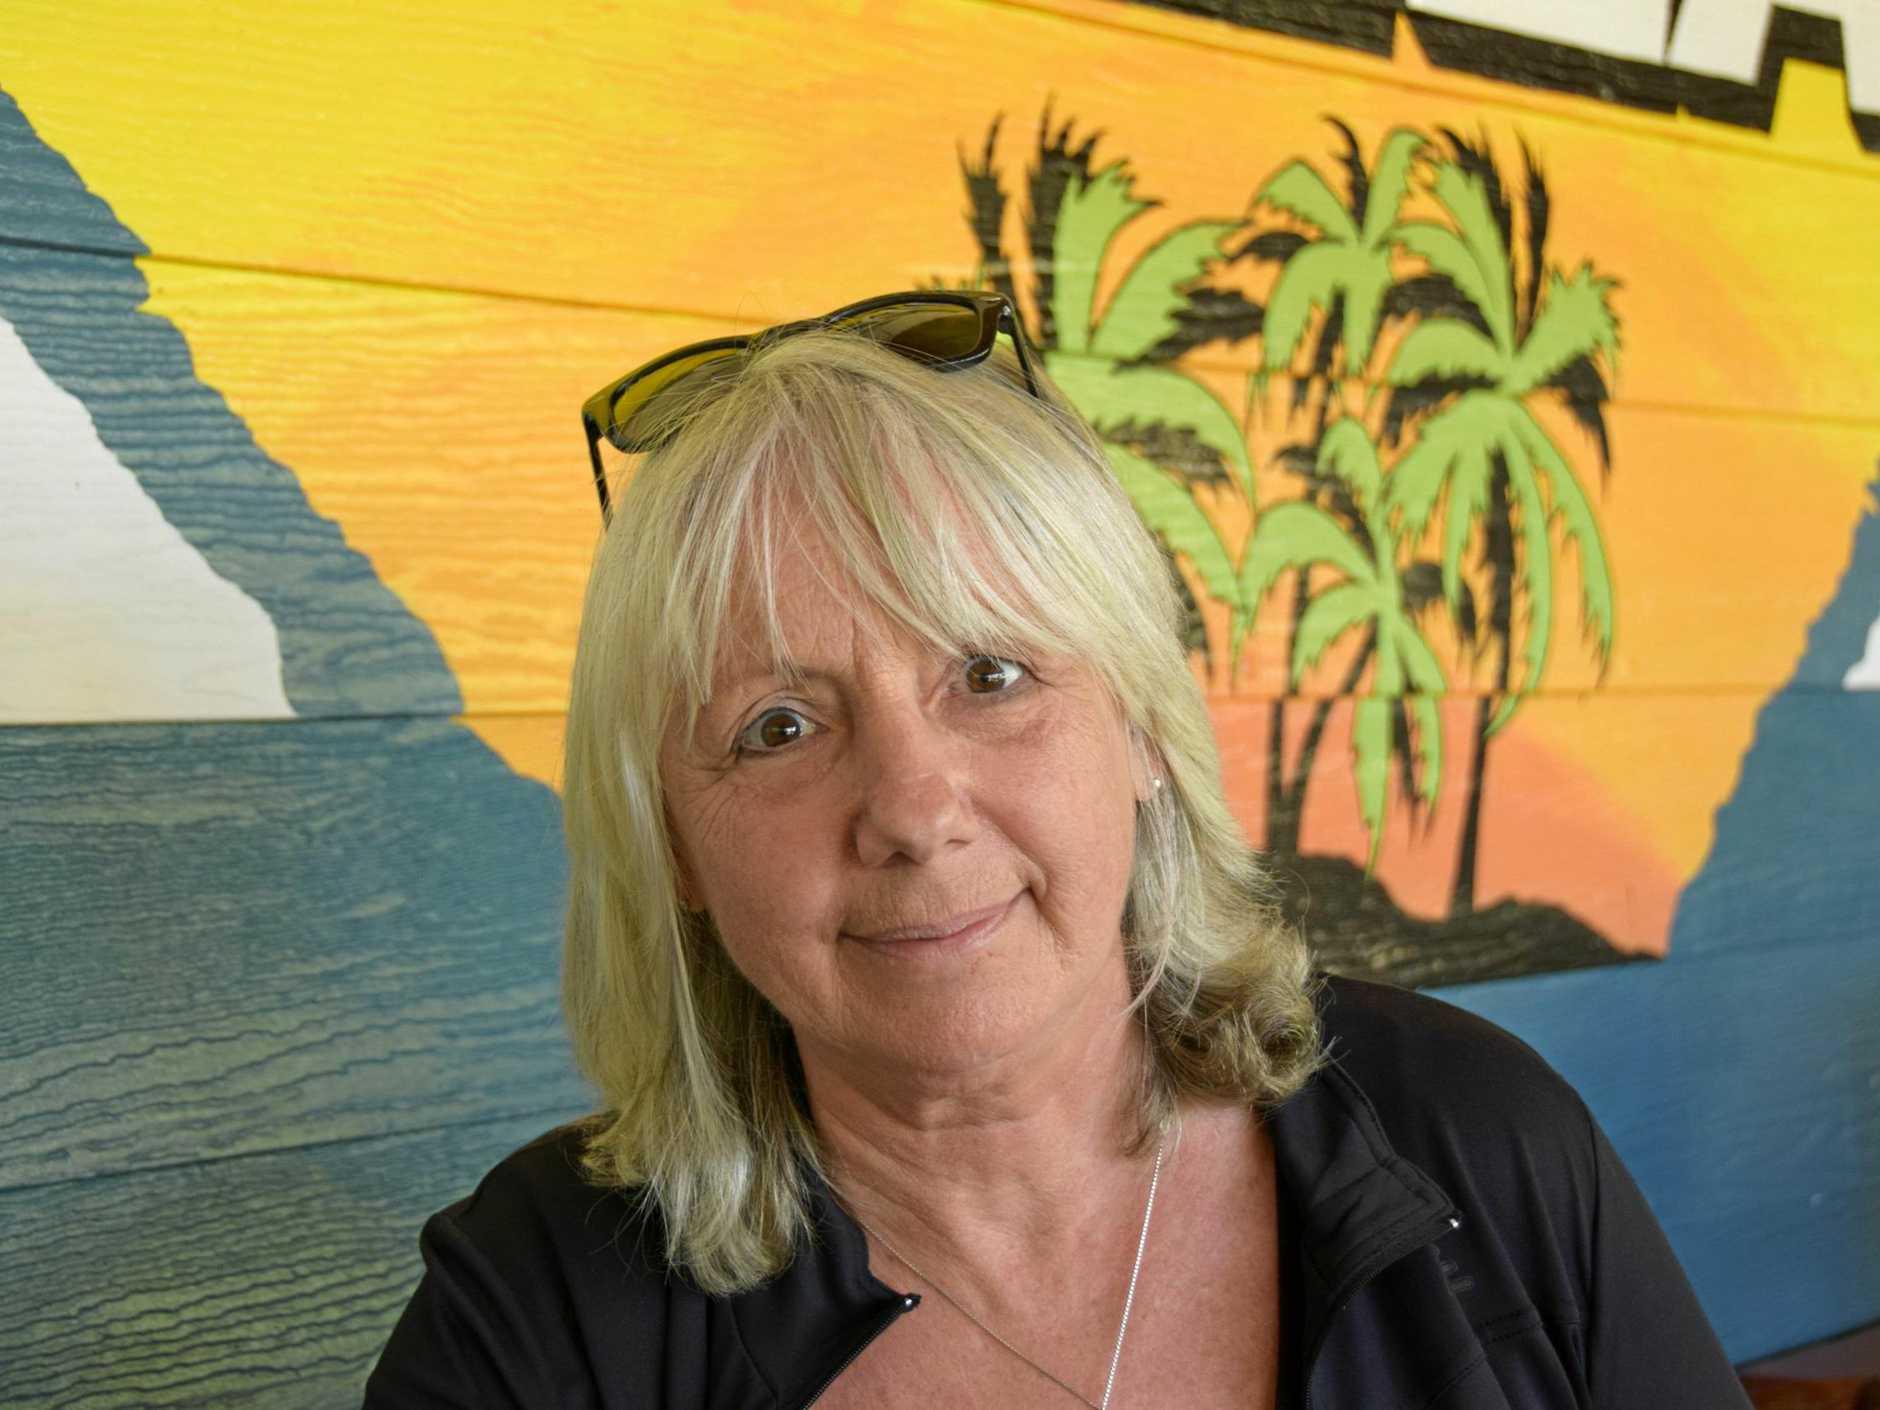 Island Pizza owner Karen Christie.